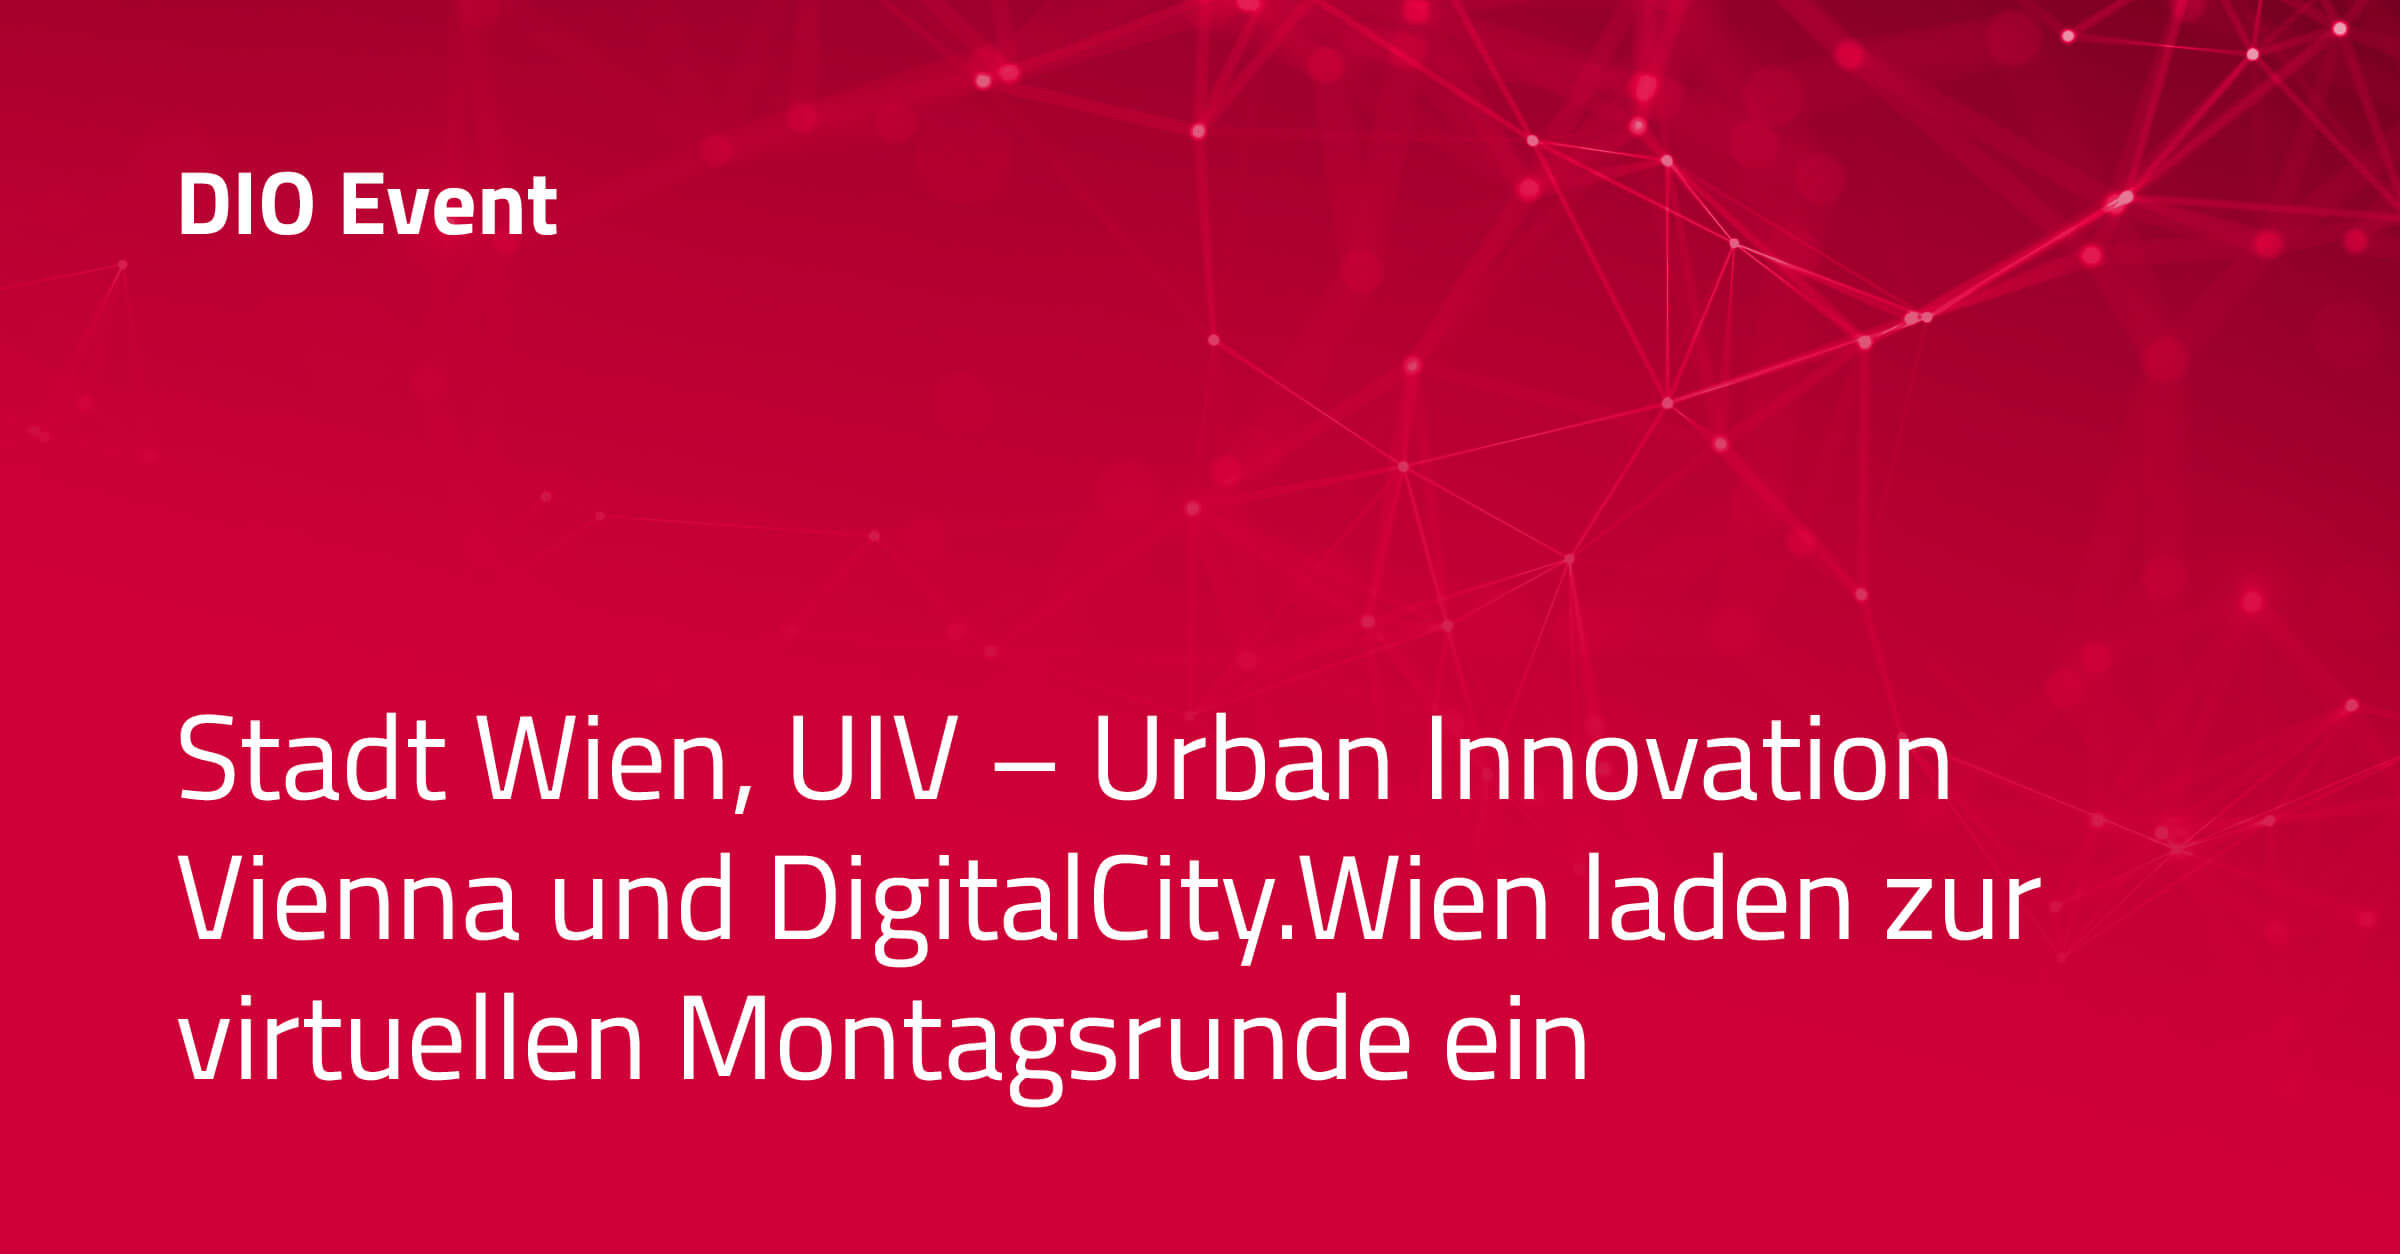 DIO_Event_StadtWienUIV